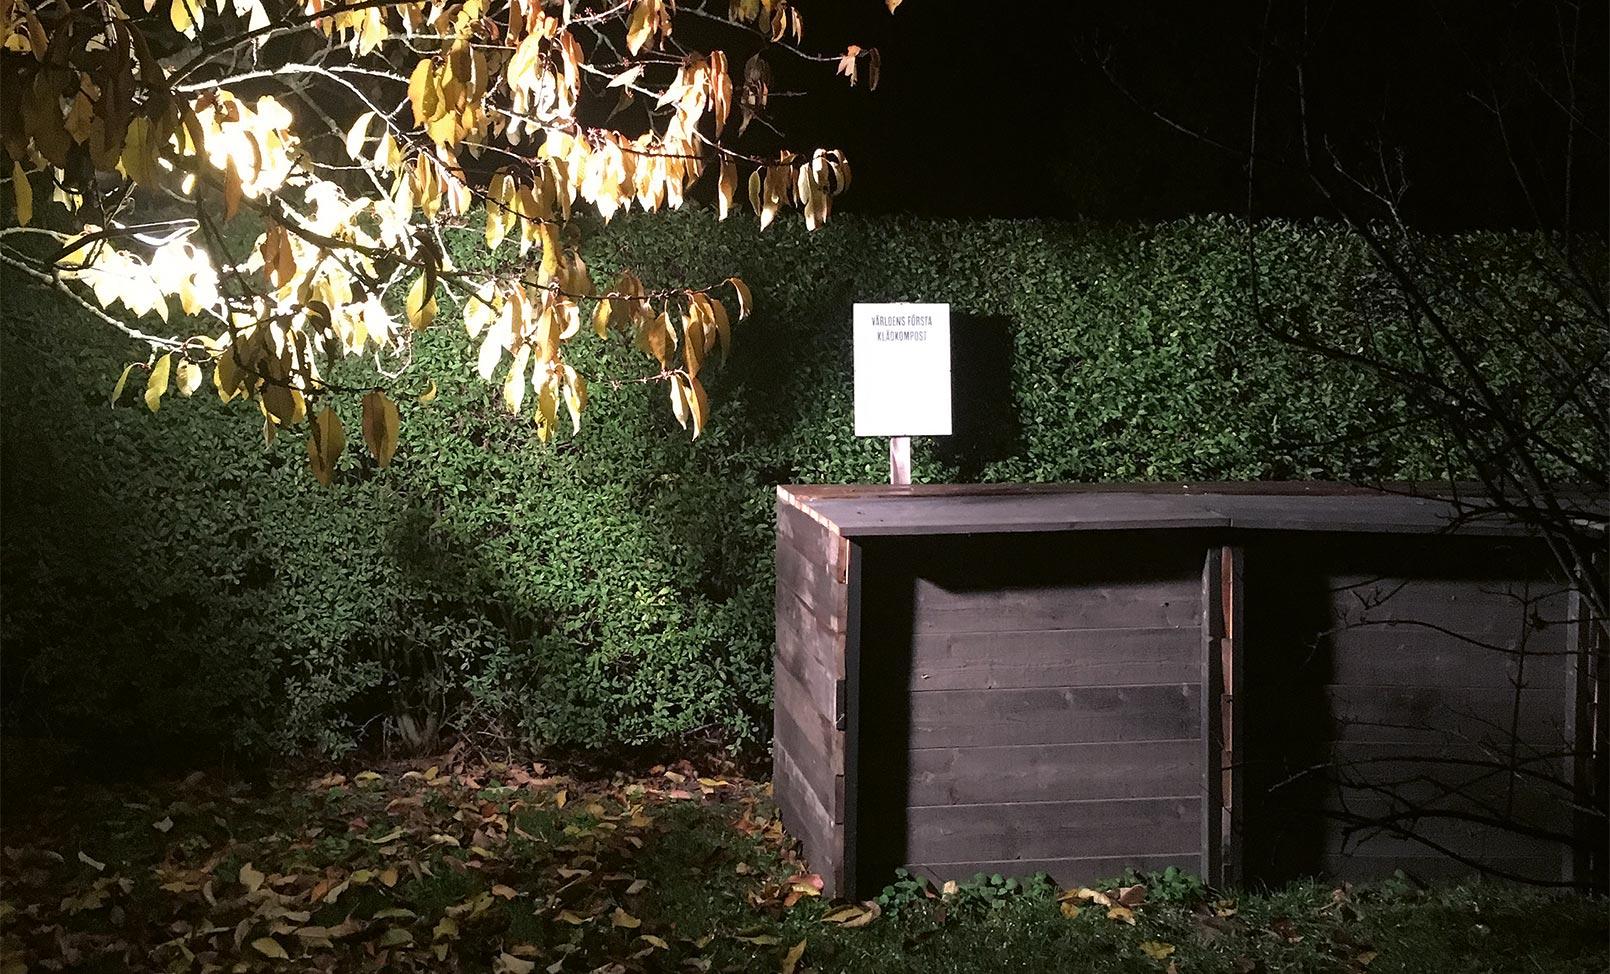 Houdini composting